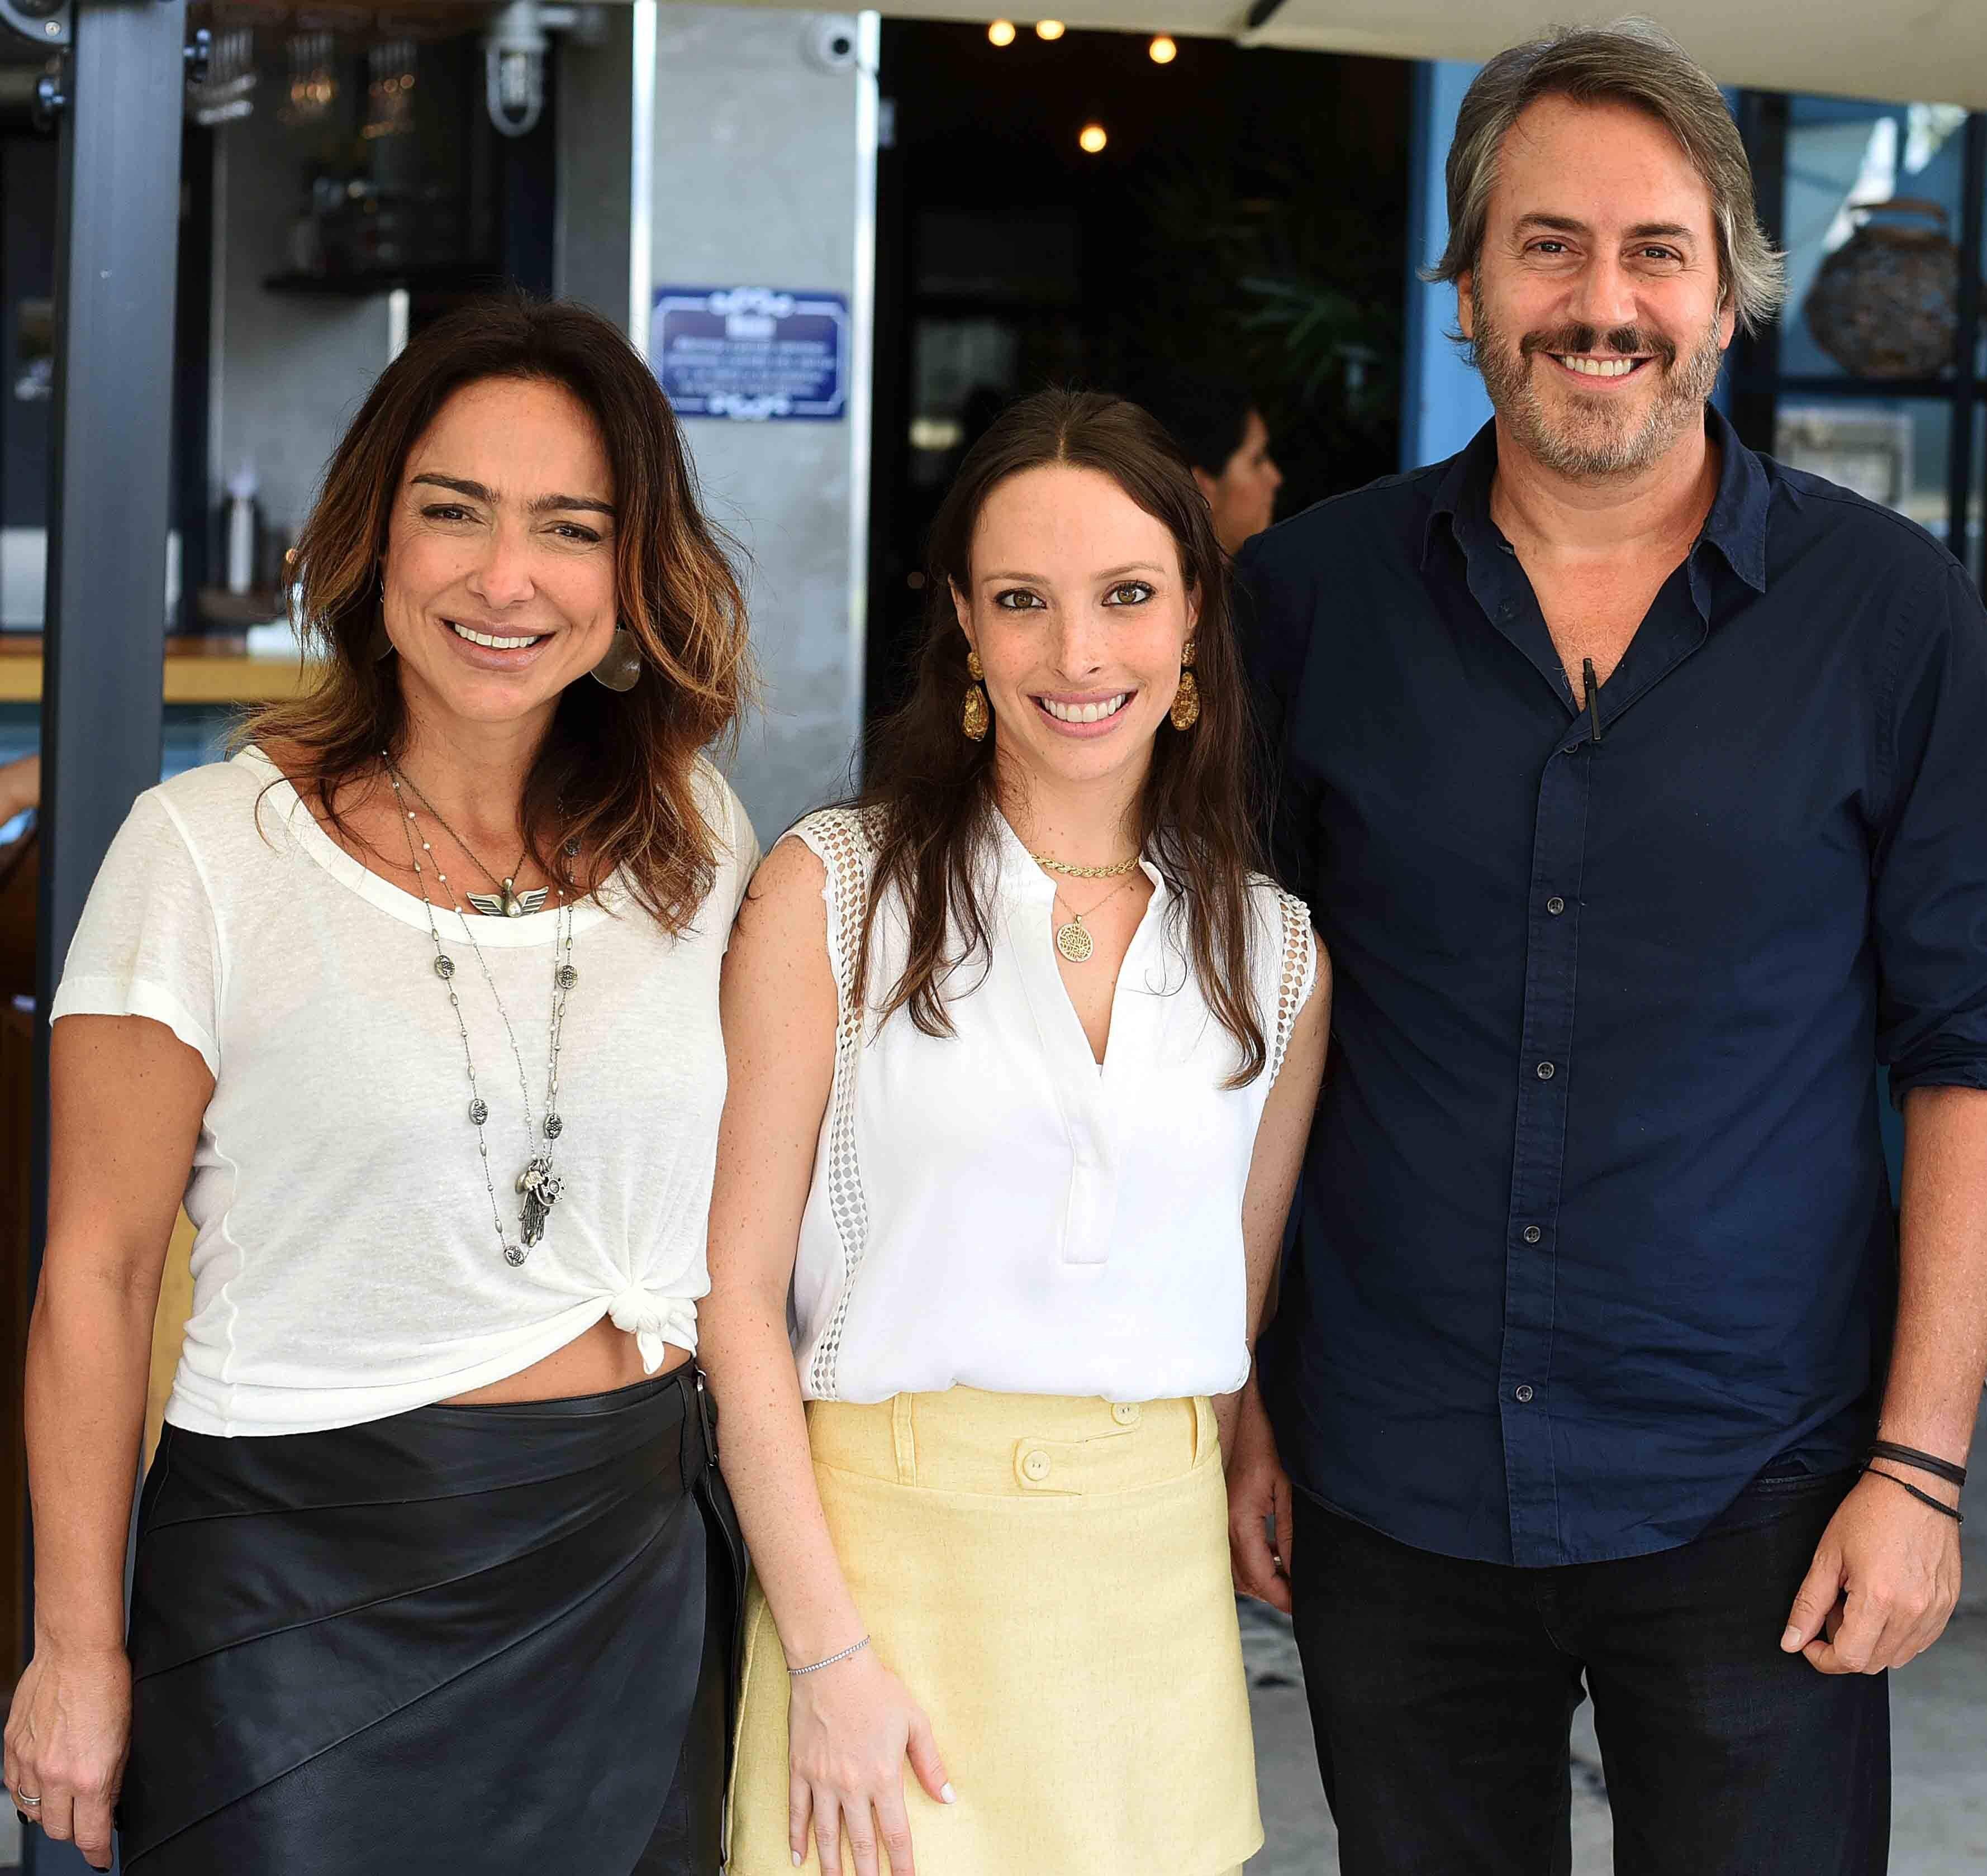 Ana Paula Iespa, Giselle Rivkind e Sergio Conde Caldas /Foto: Ari Kaye